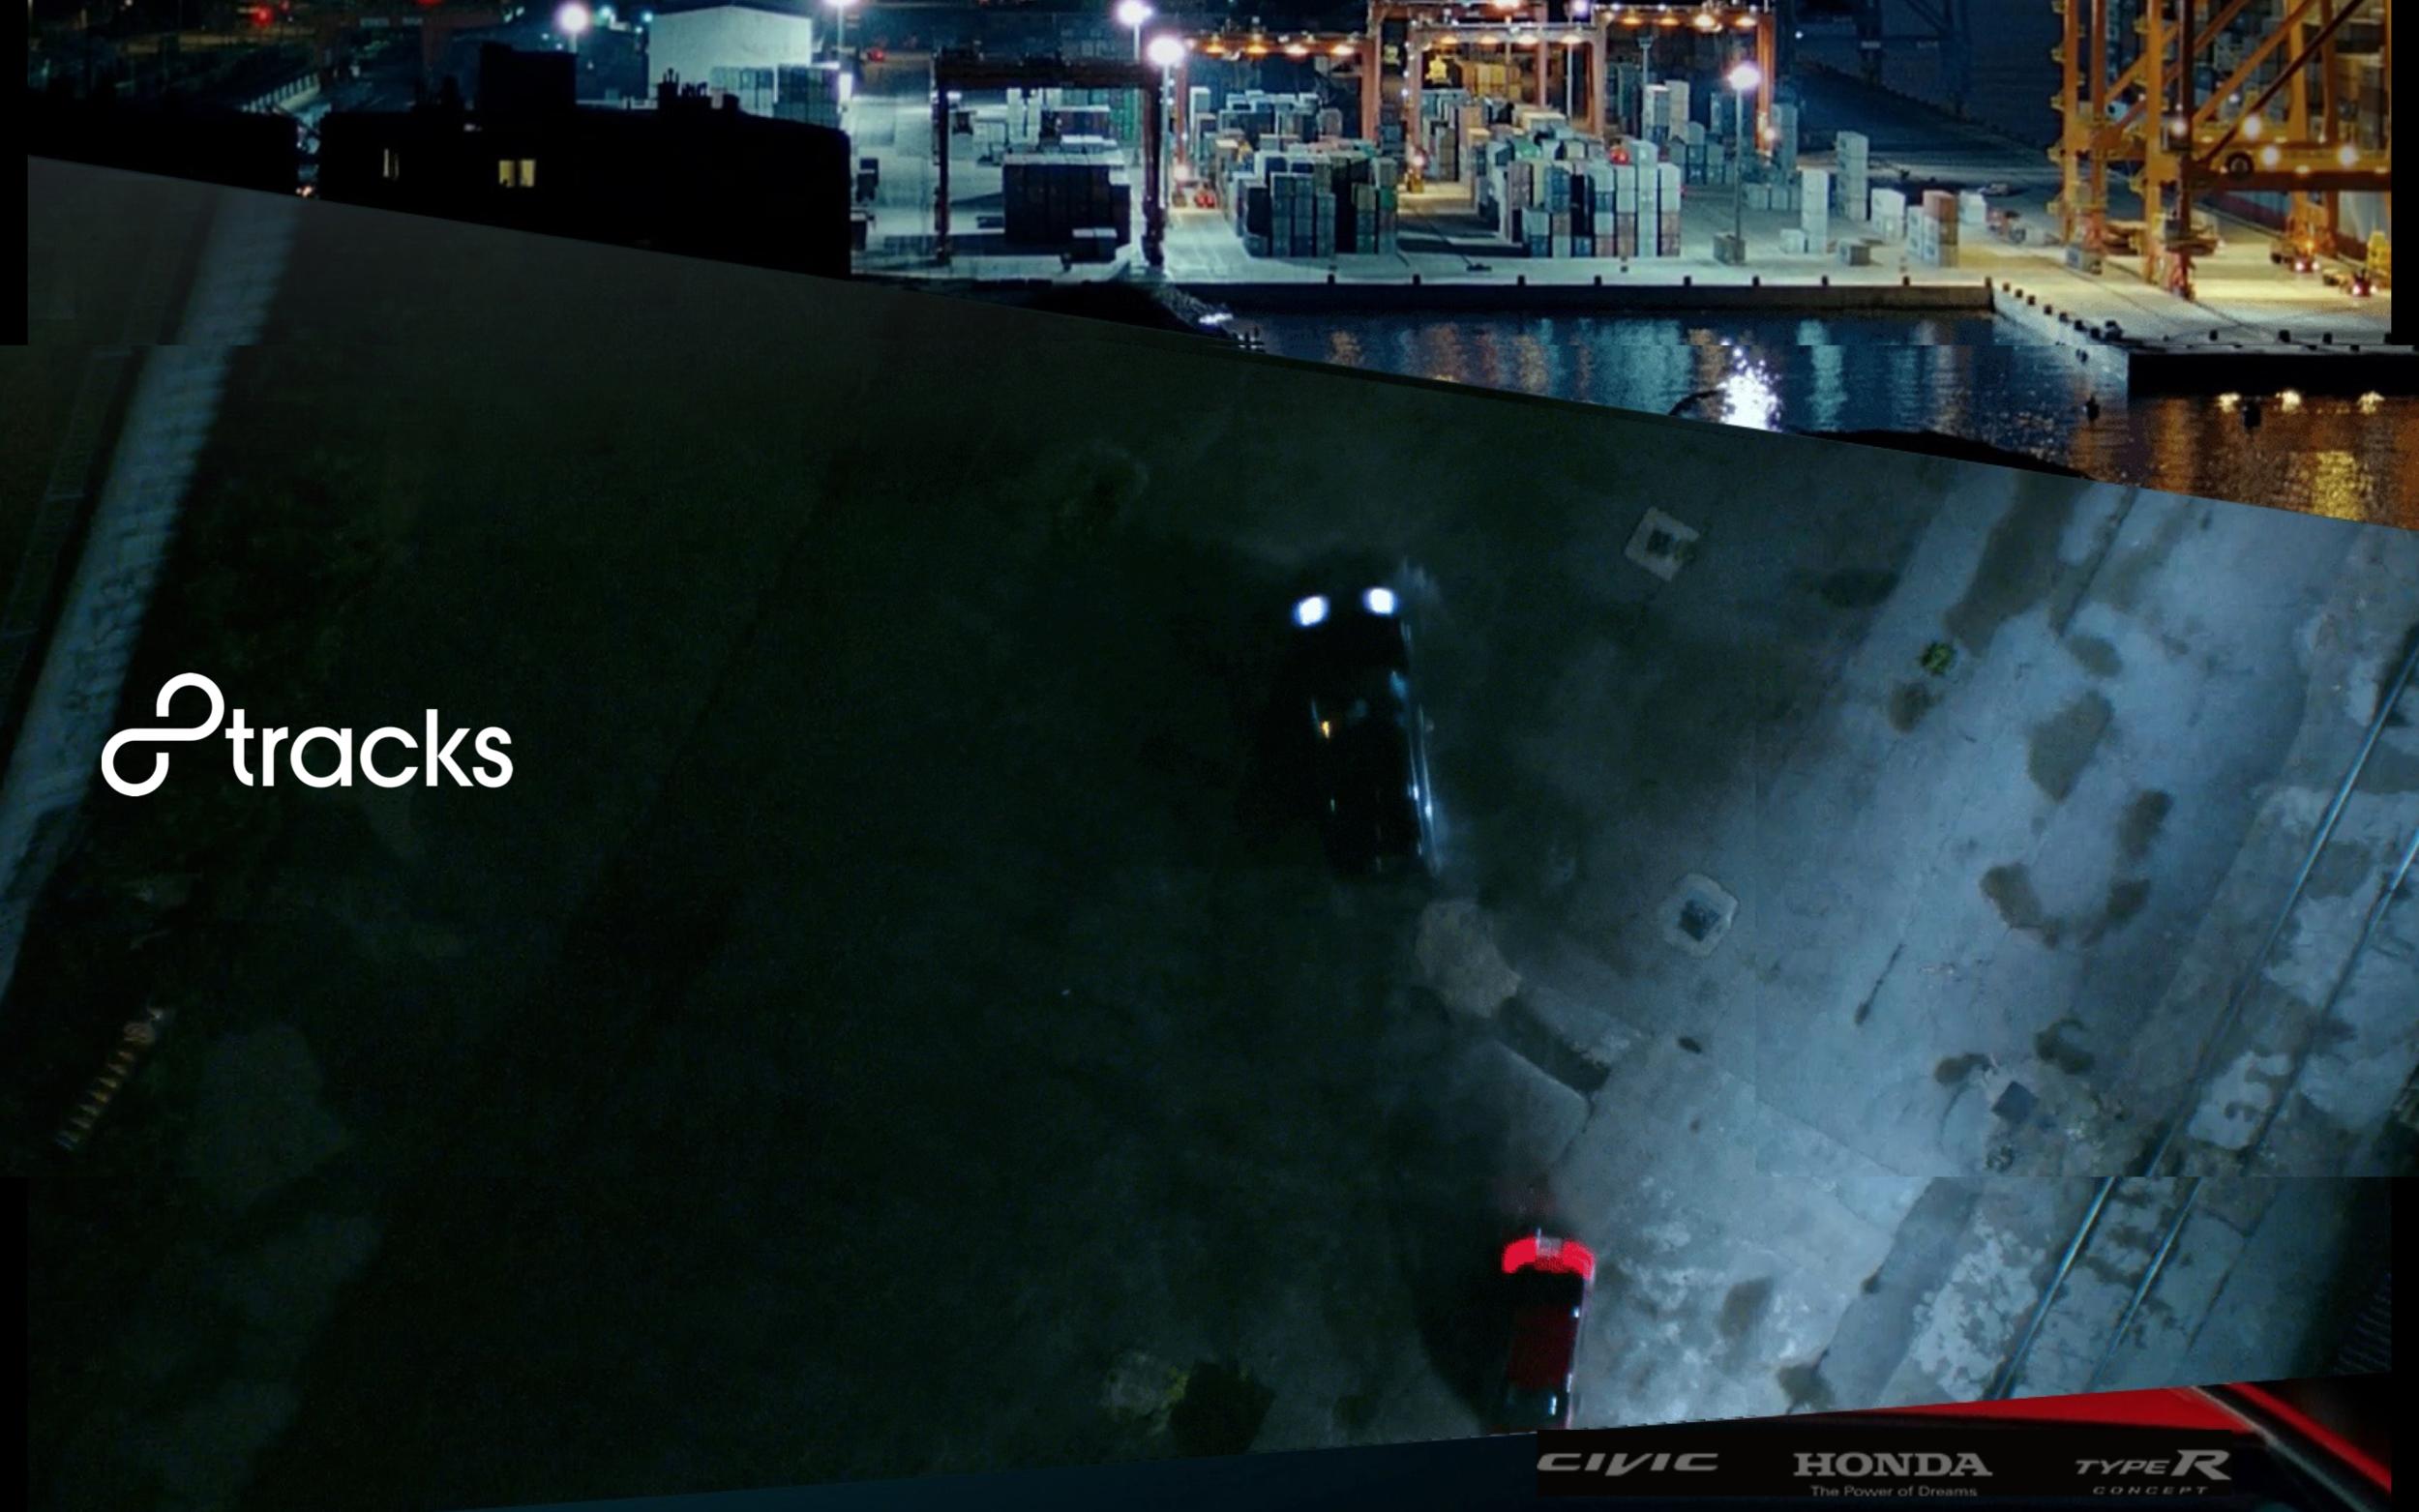 Screenshot 2014-11-19 23.19.08.png